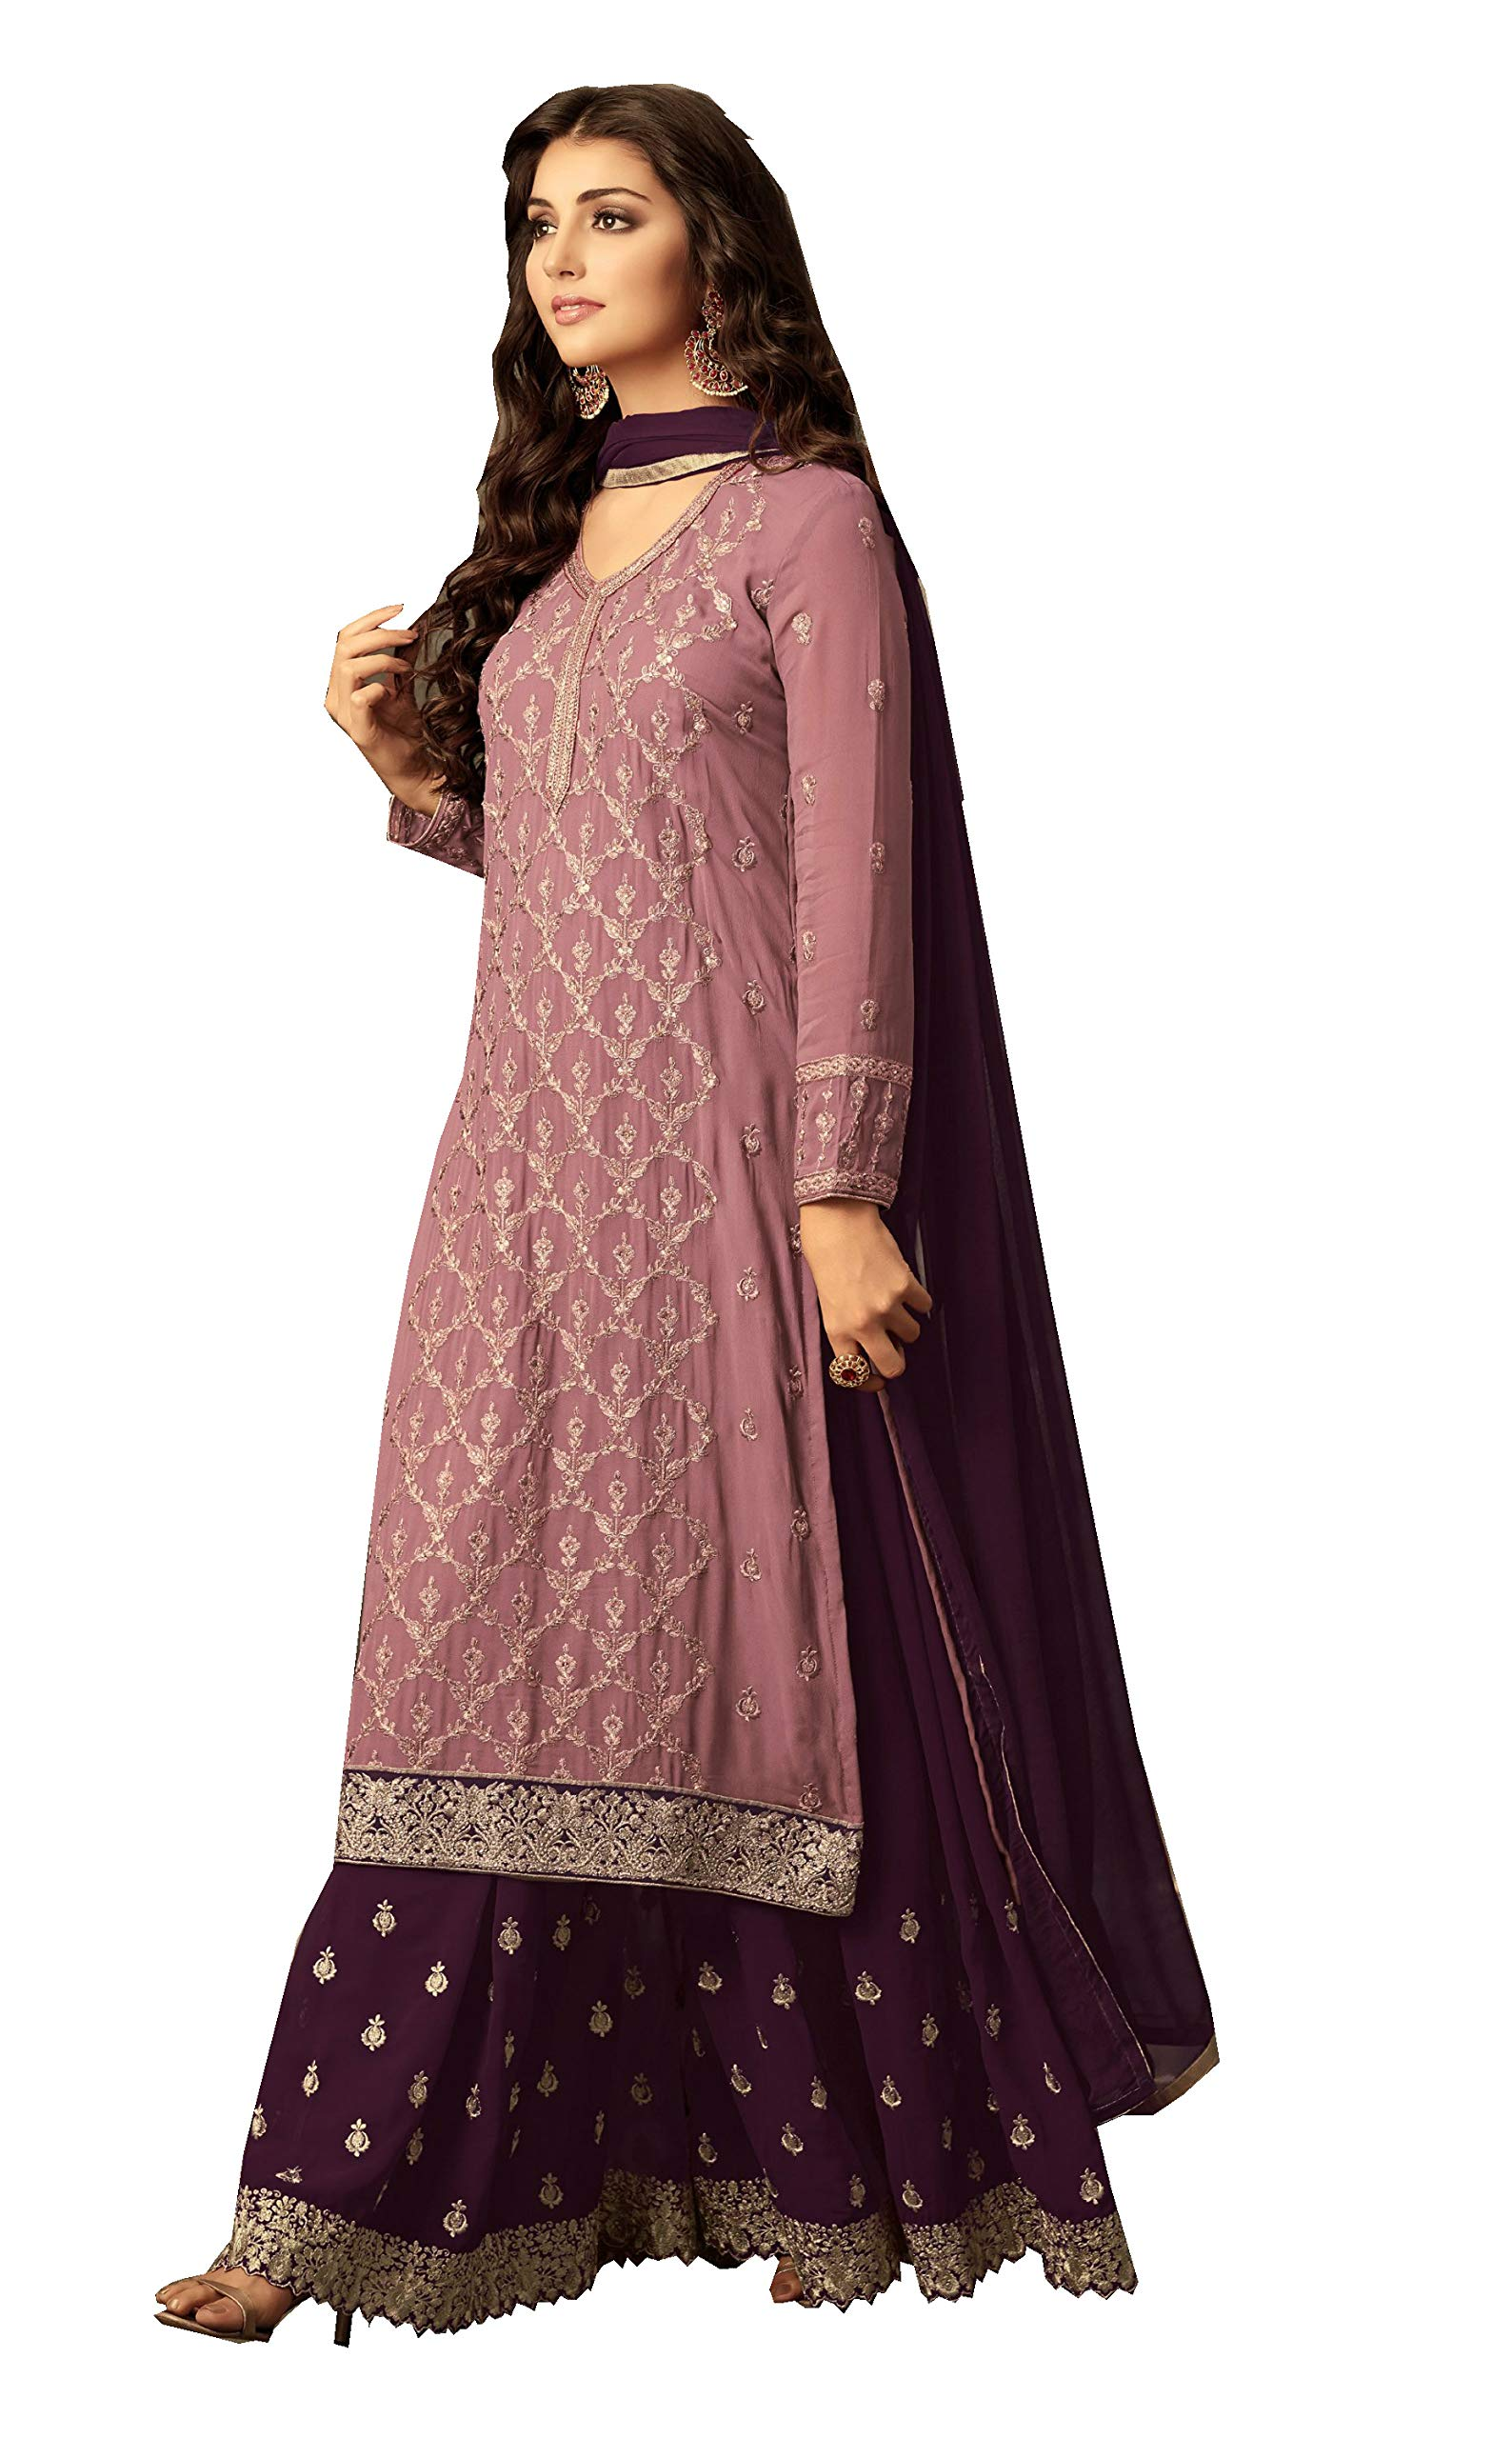 Koti Indian Fashion Dresses for Women RH-4111 (X-LARGE-44, Pink)